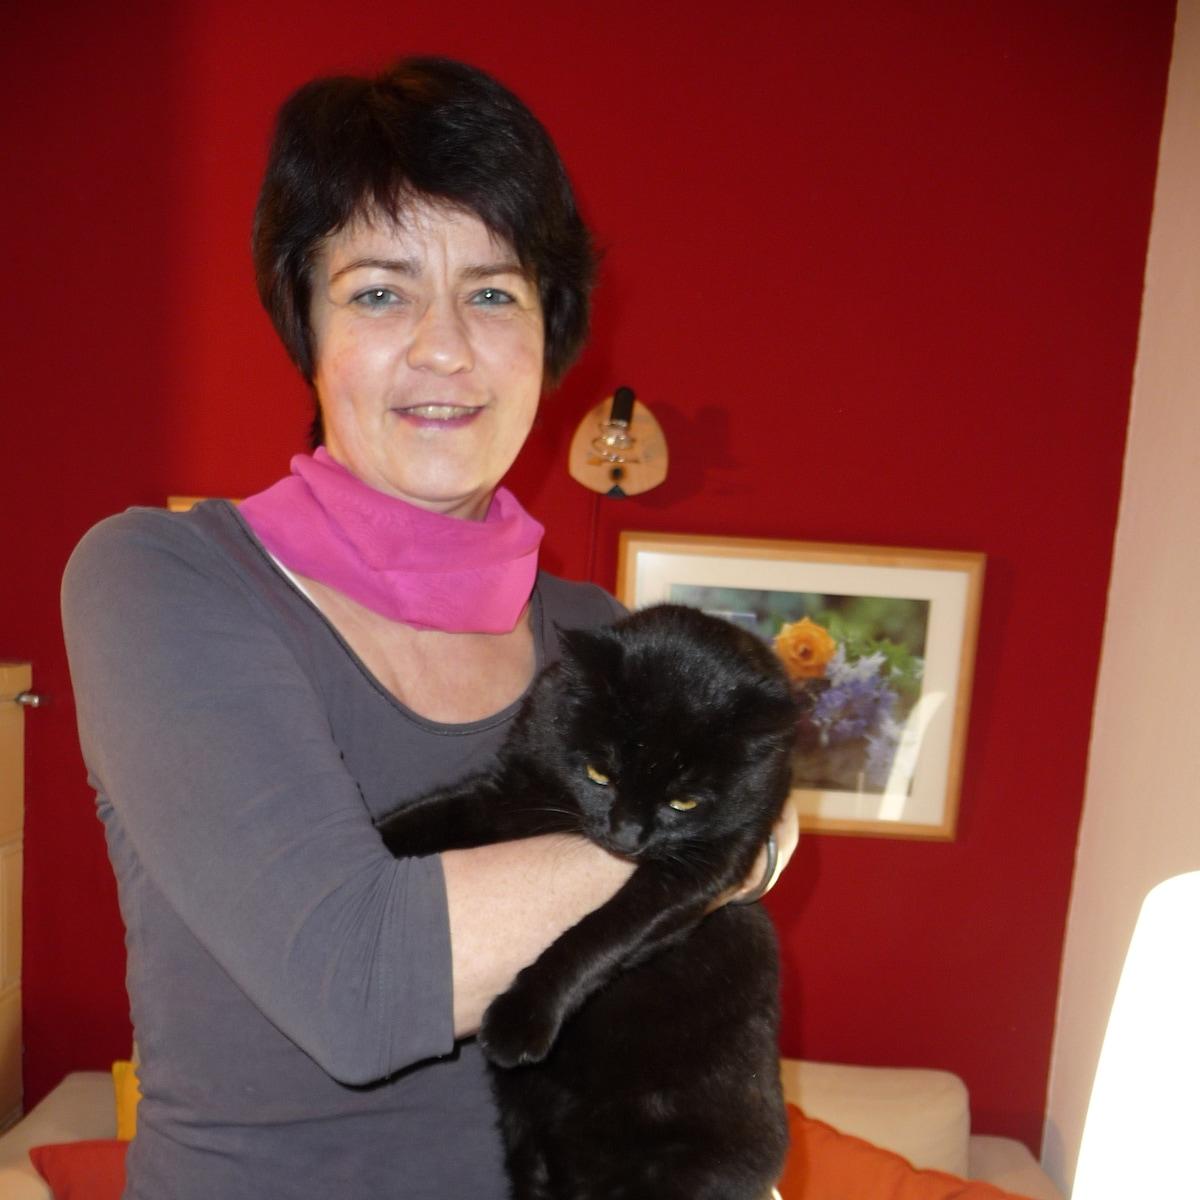 Christiane from Karlsruhe